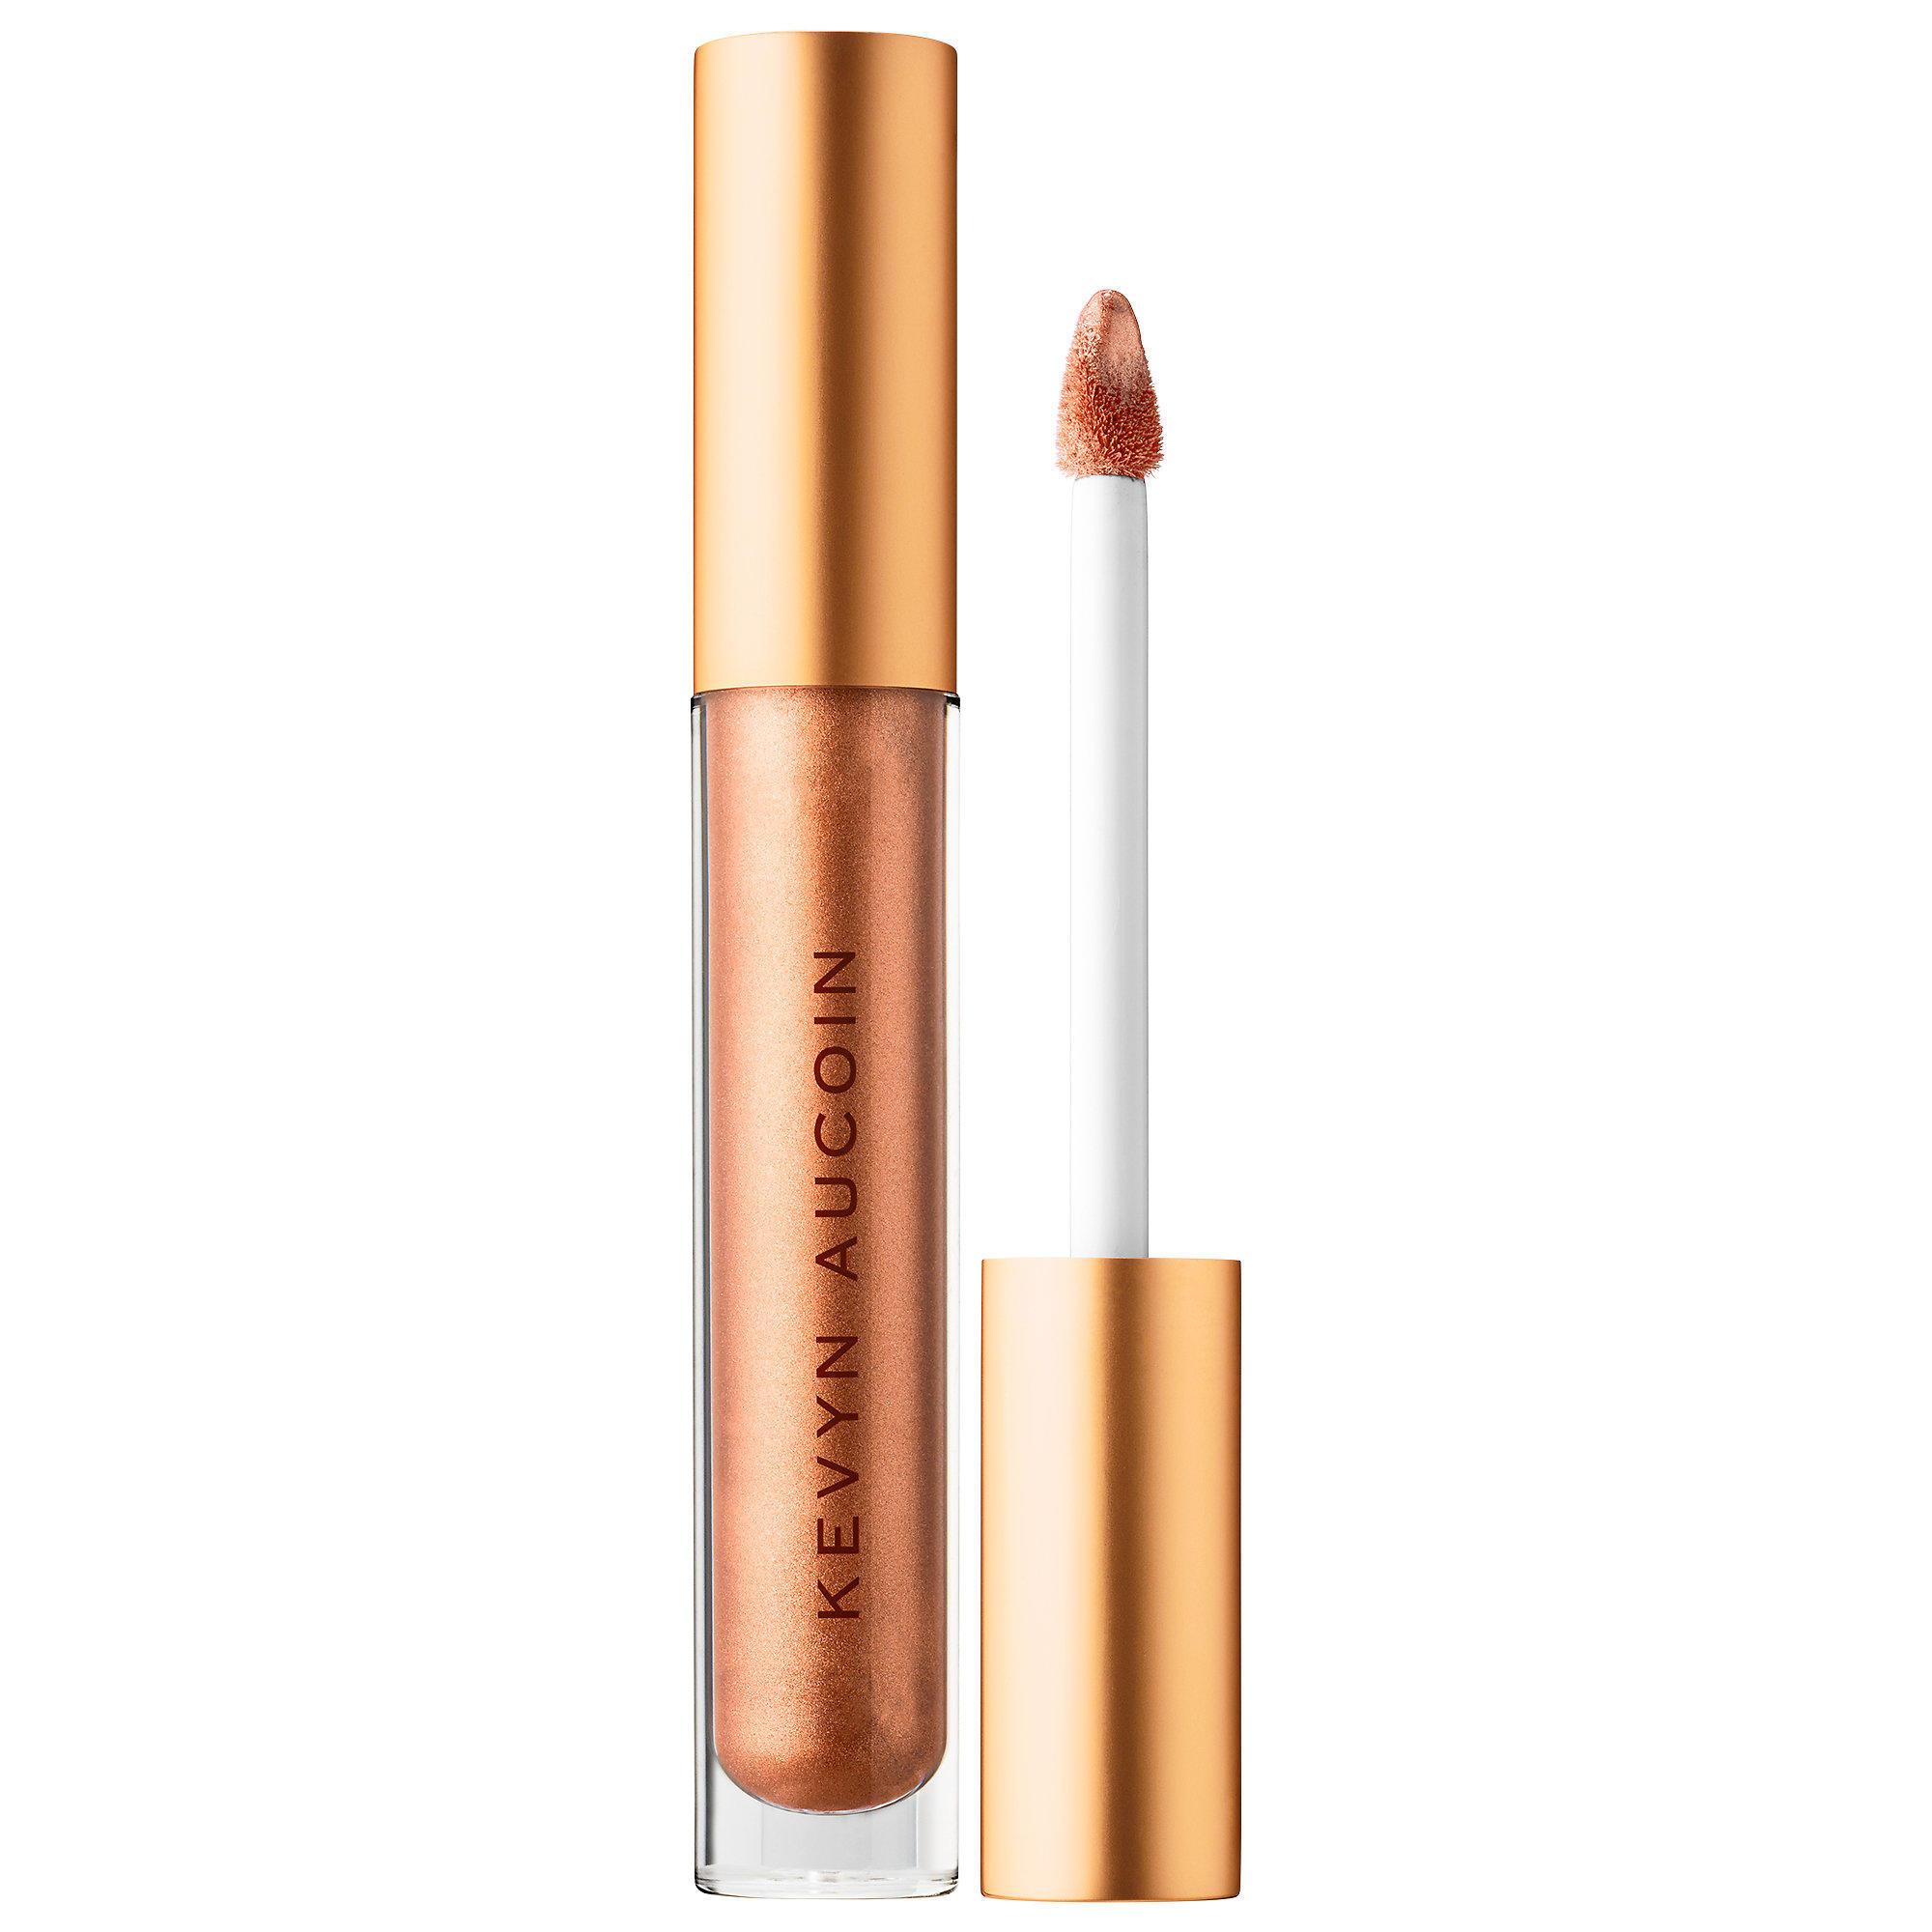 Kevyn Aucoin The Molten Lip Color Copper